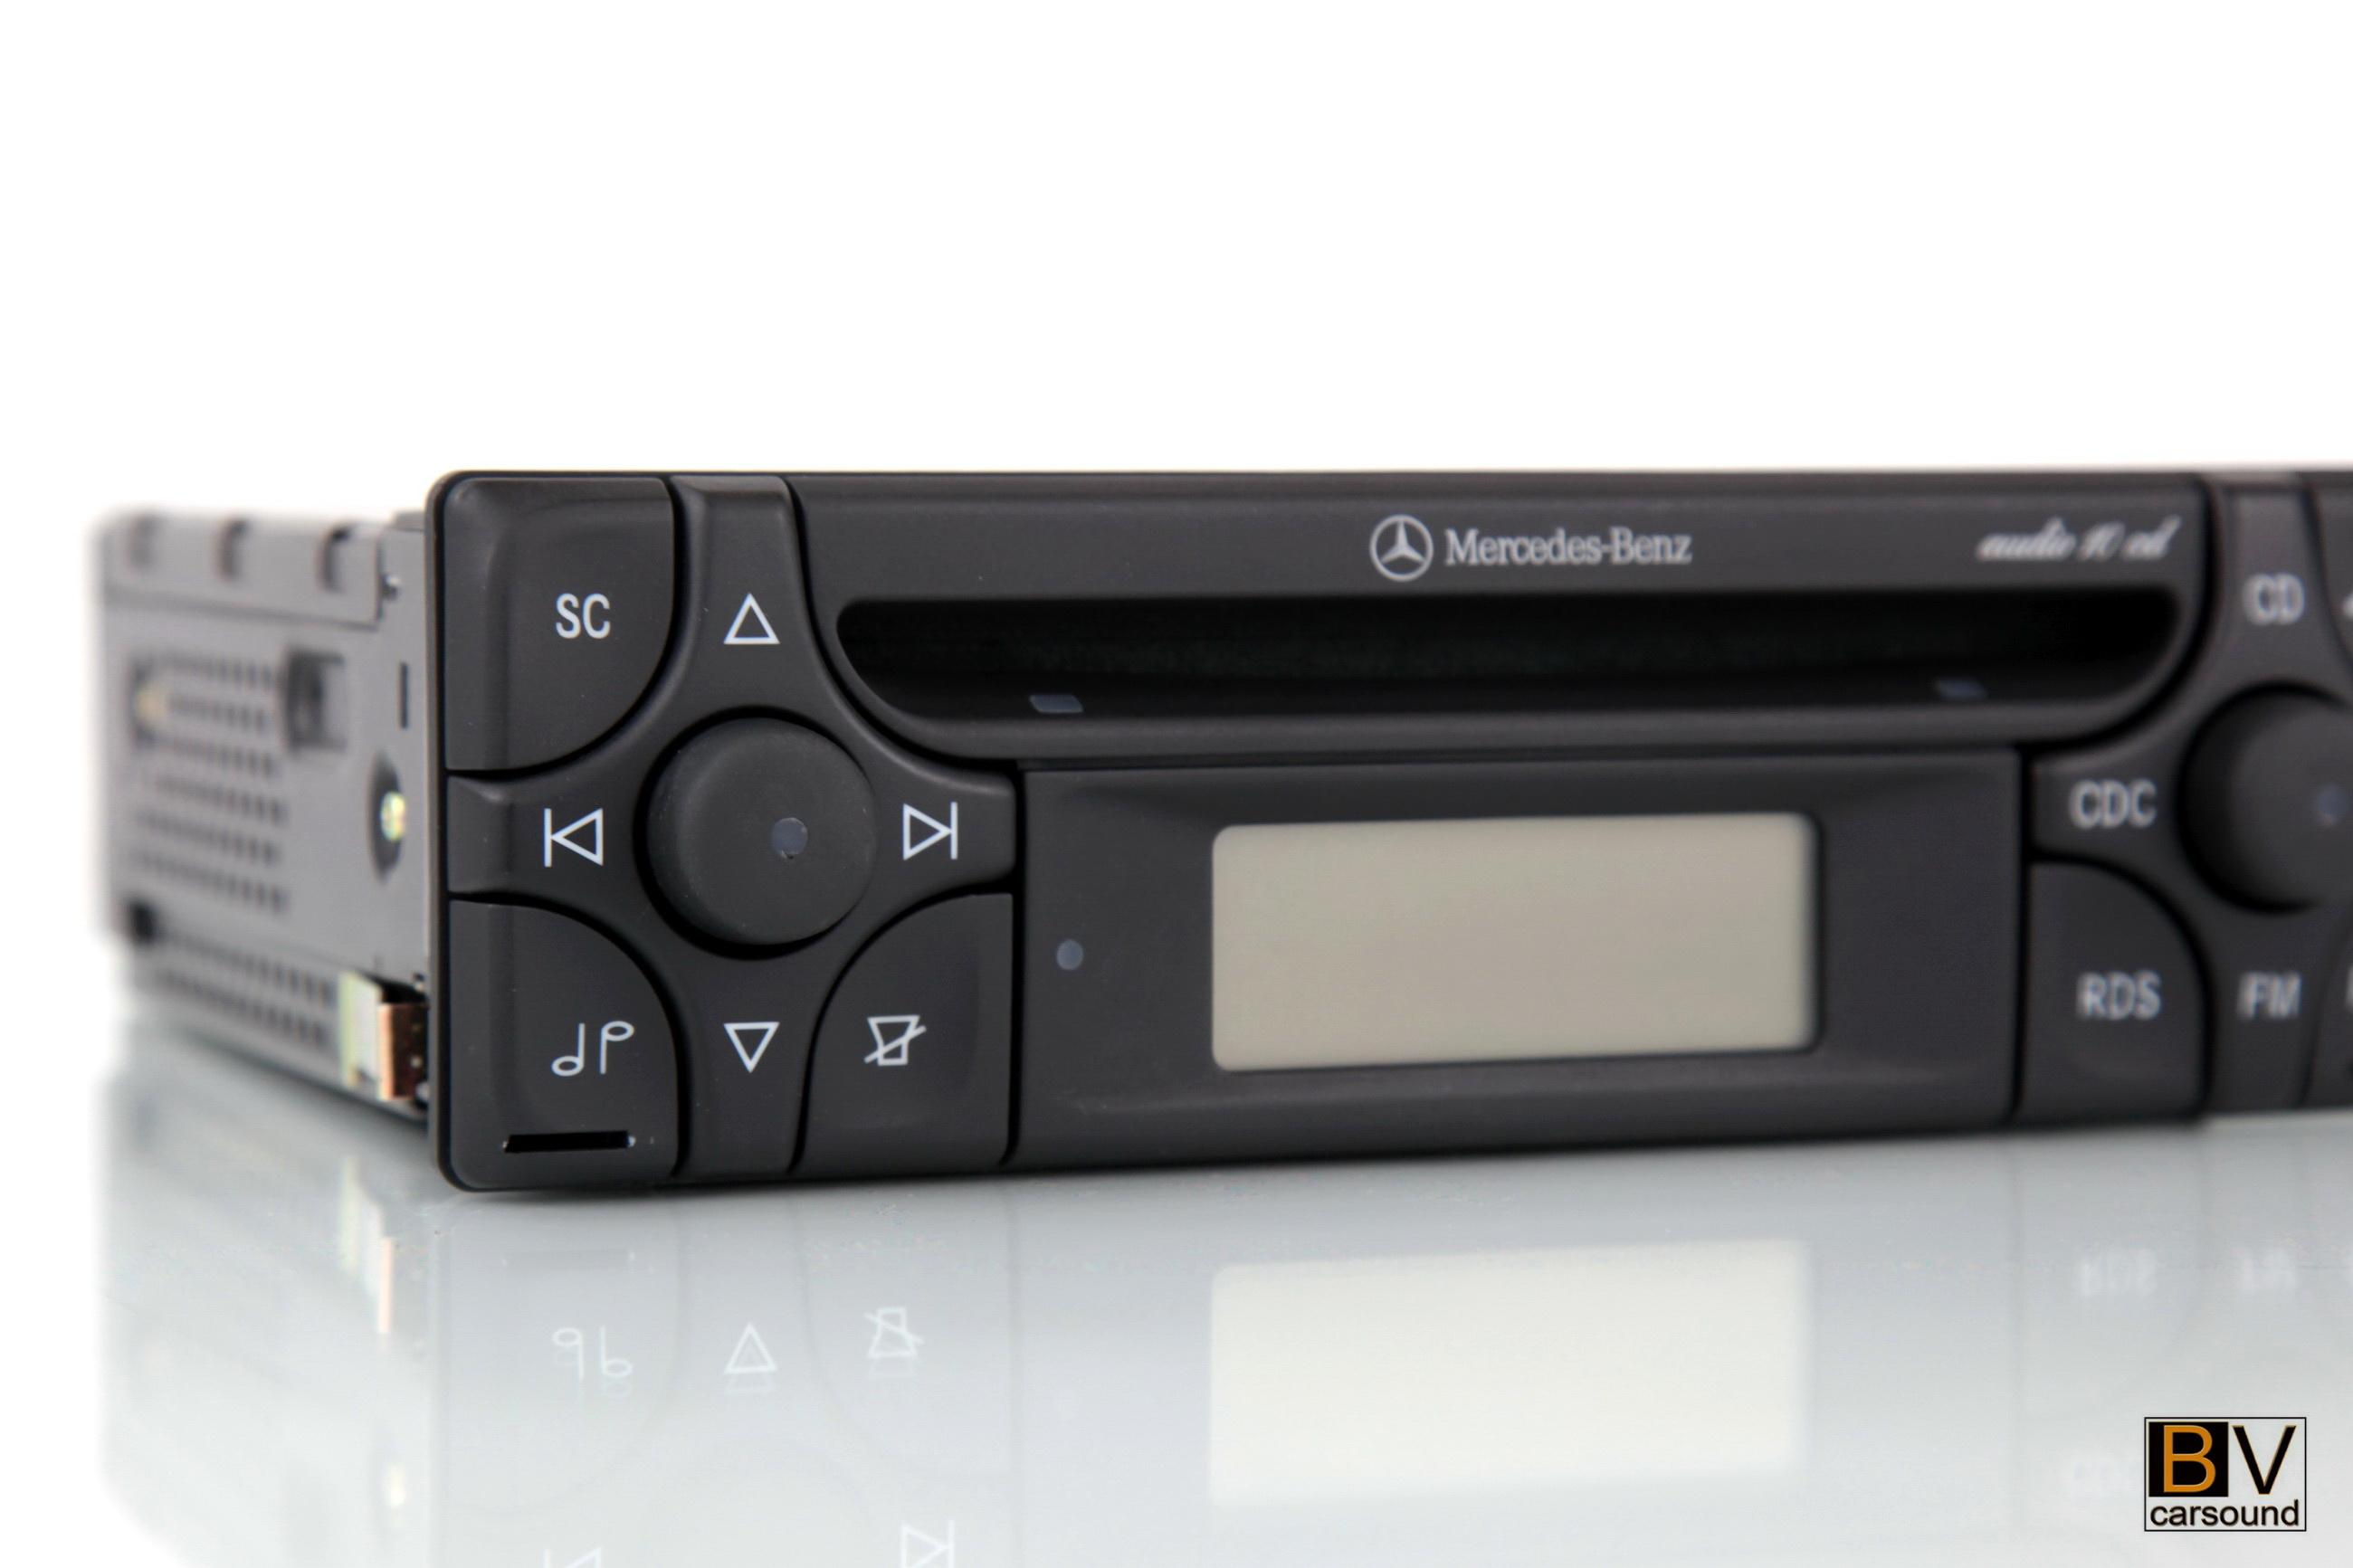 radio mercedes audio 10 cd aux mp3 alpine mf2910 slk. Black Bedroom Furniture Sets. Home Design Ideas